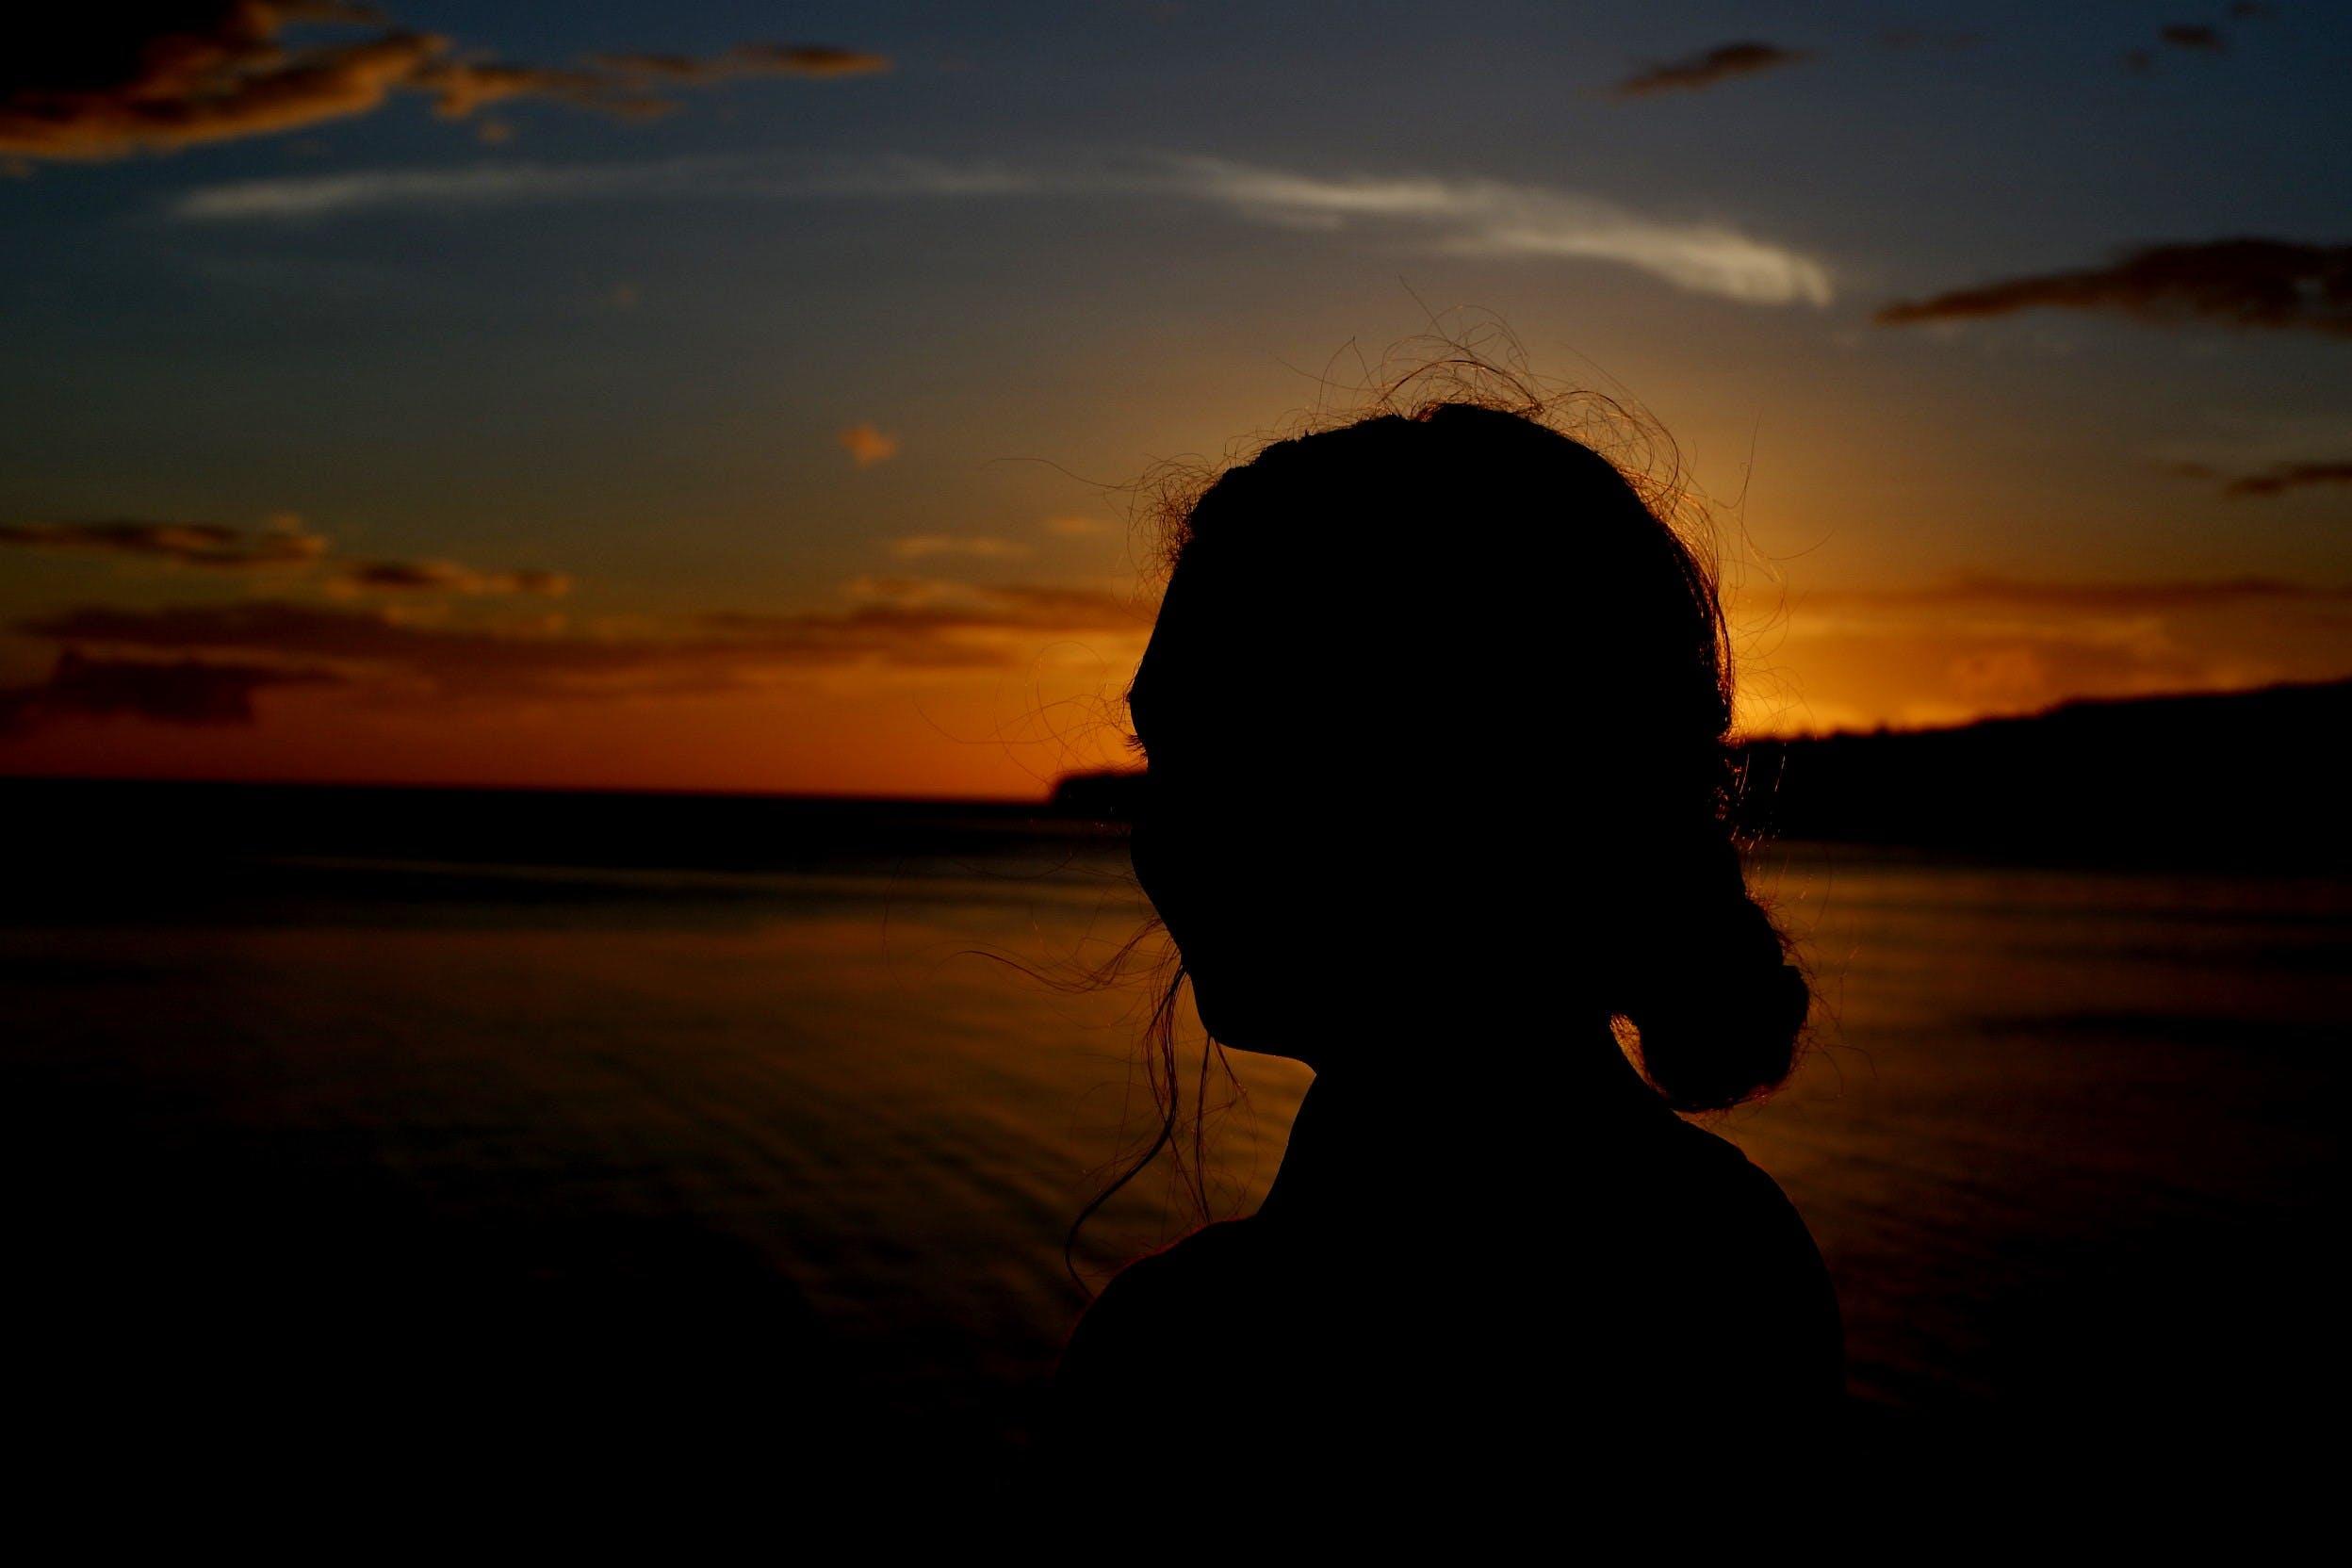 #golden, #sunset #girl #scenery #beautiful